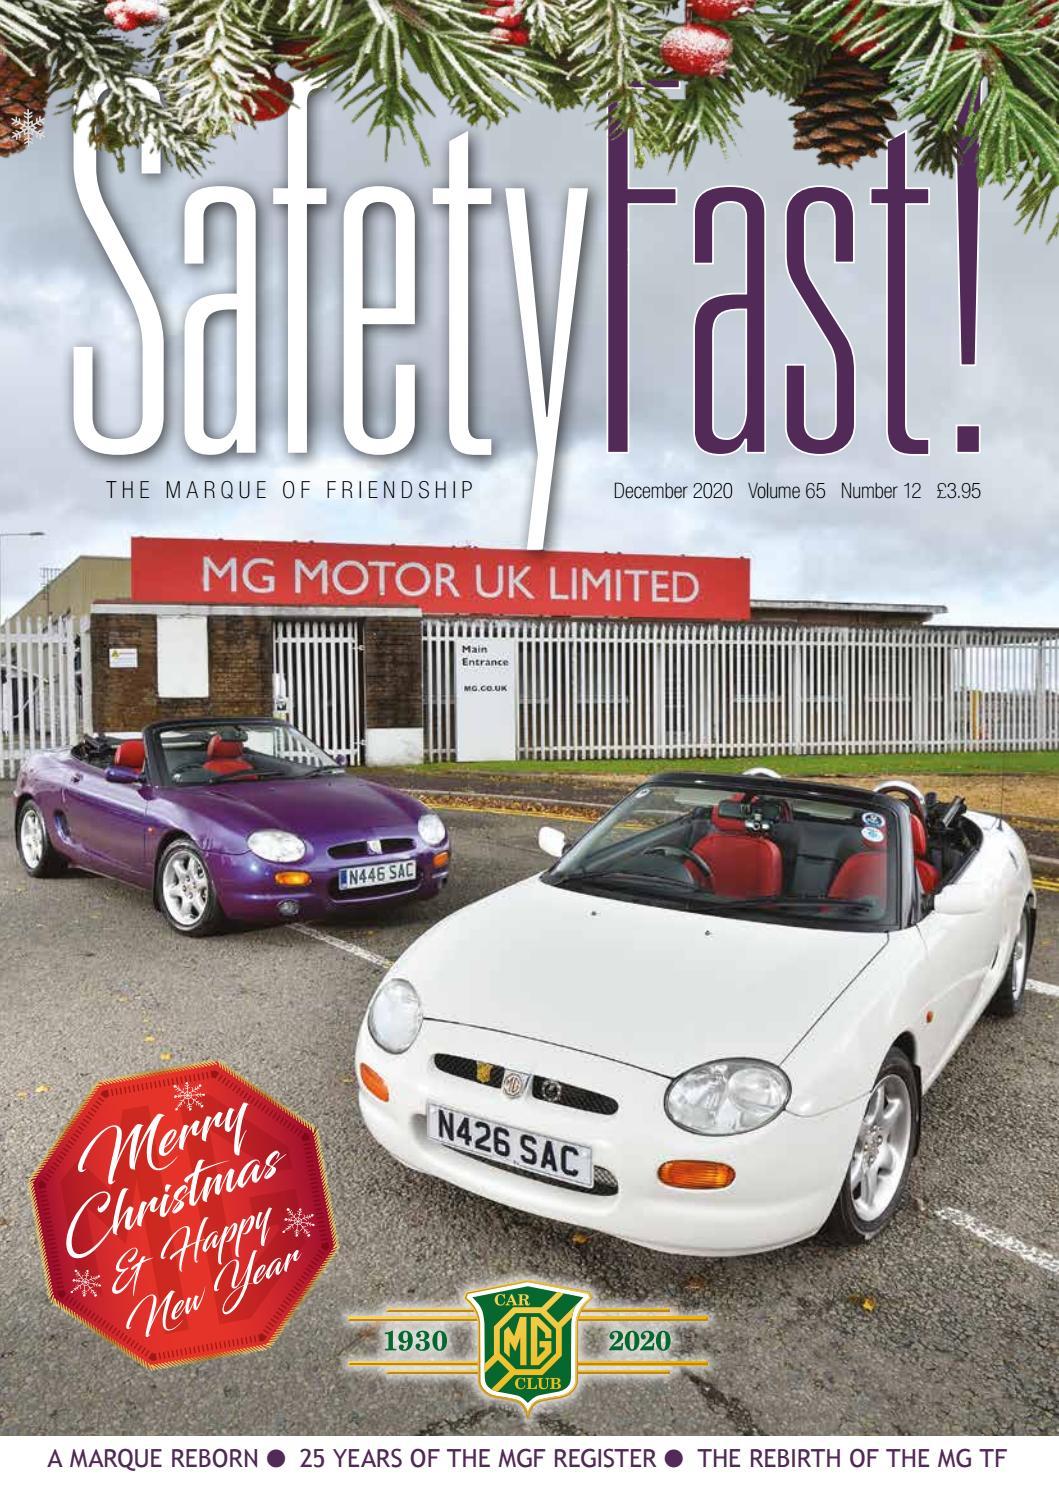 MS3 Material Stand PRICE £110.00 PLUS VAT